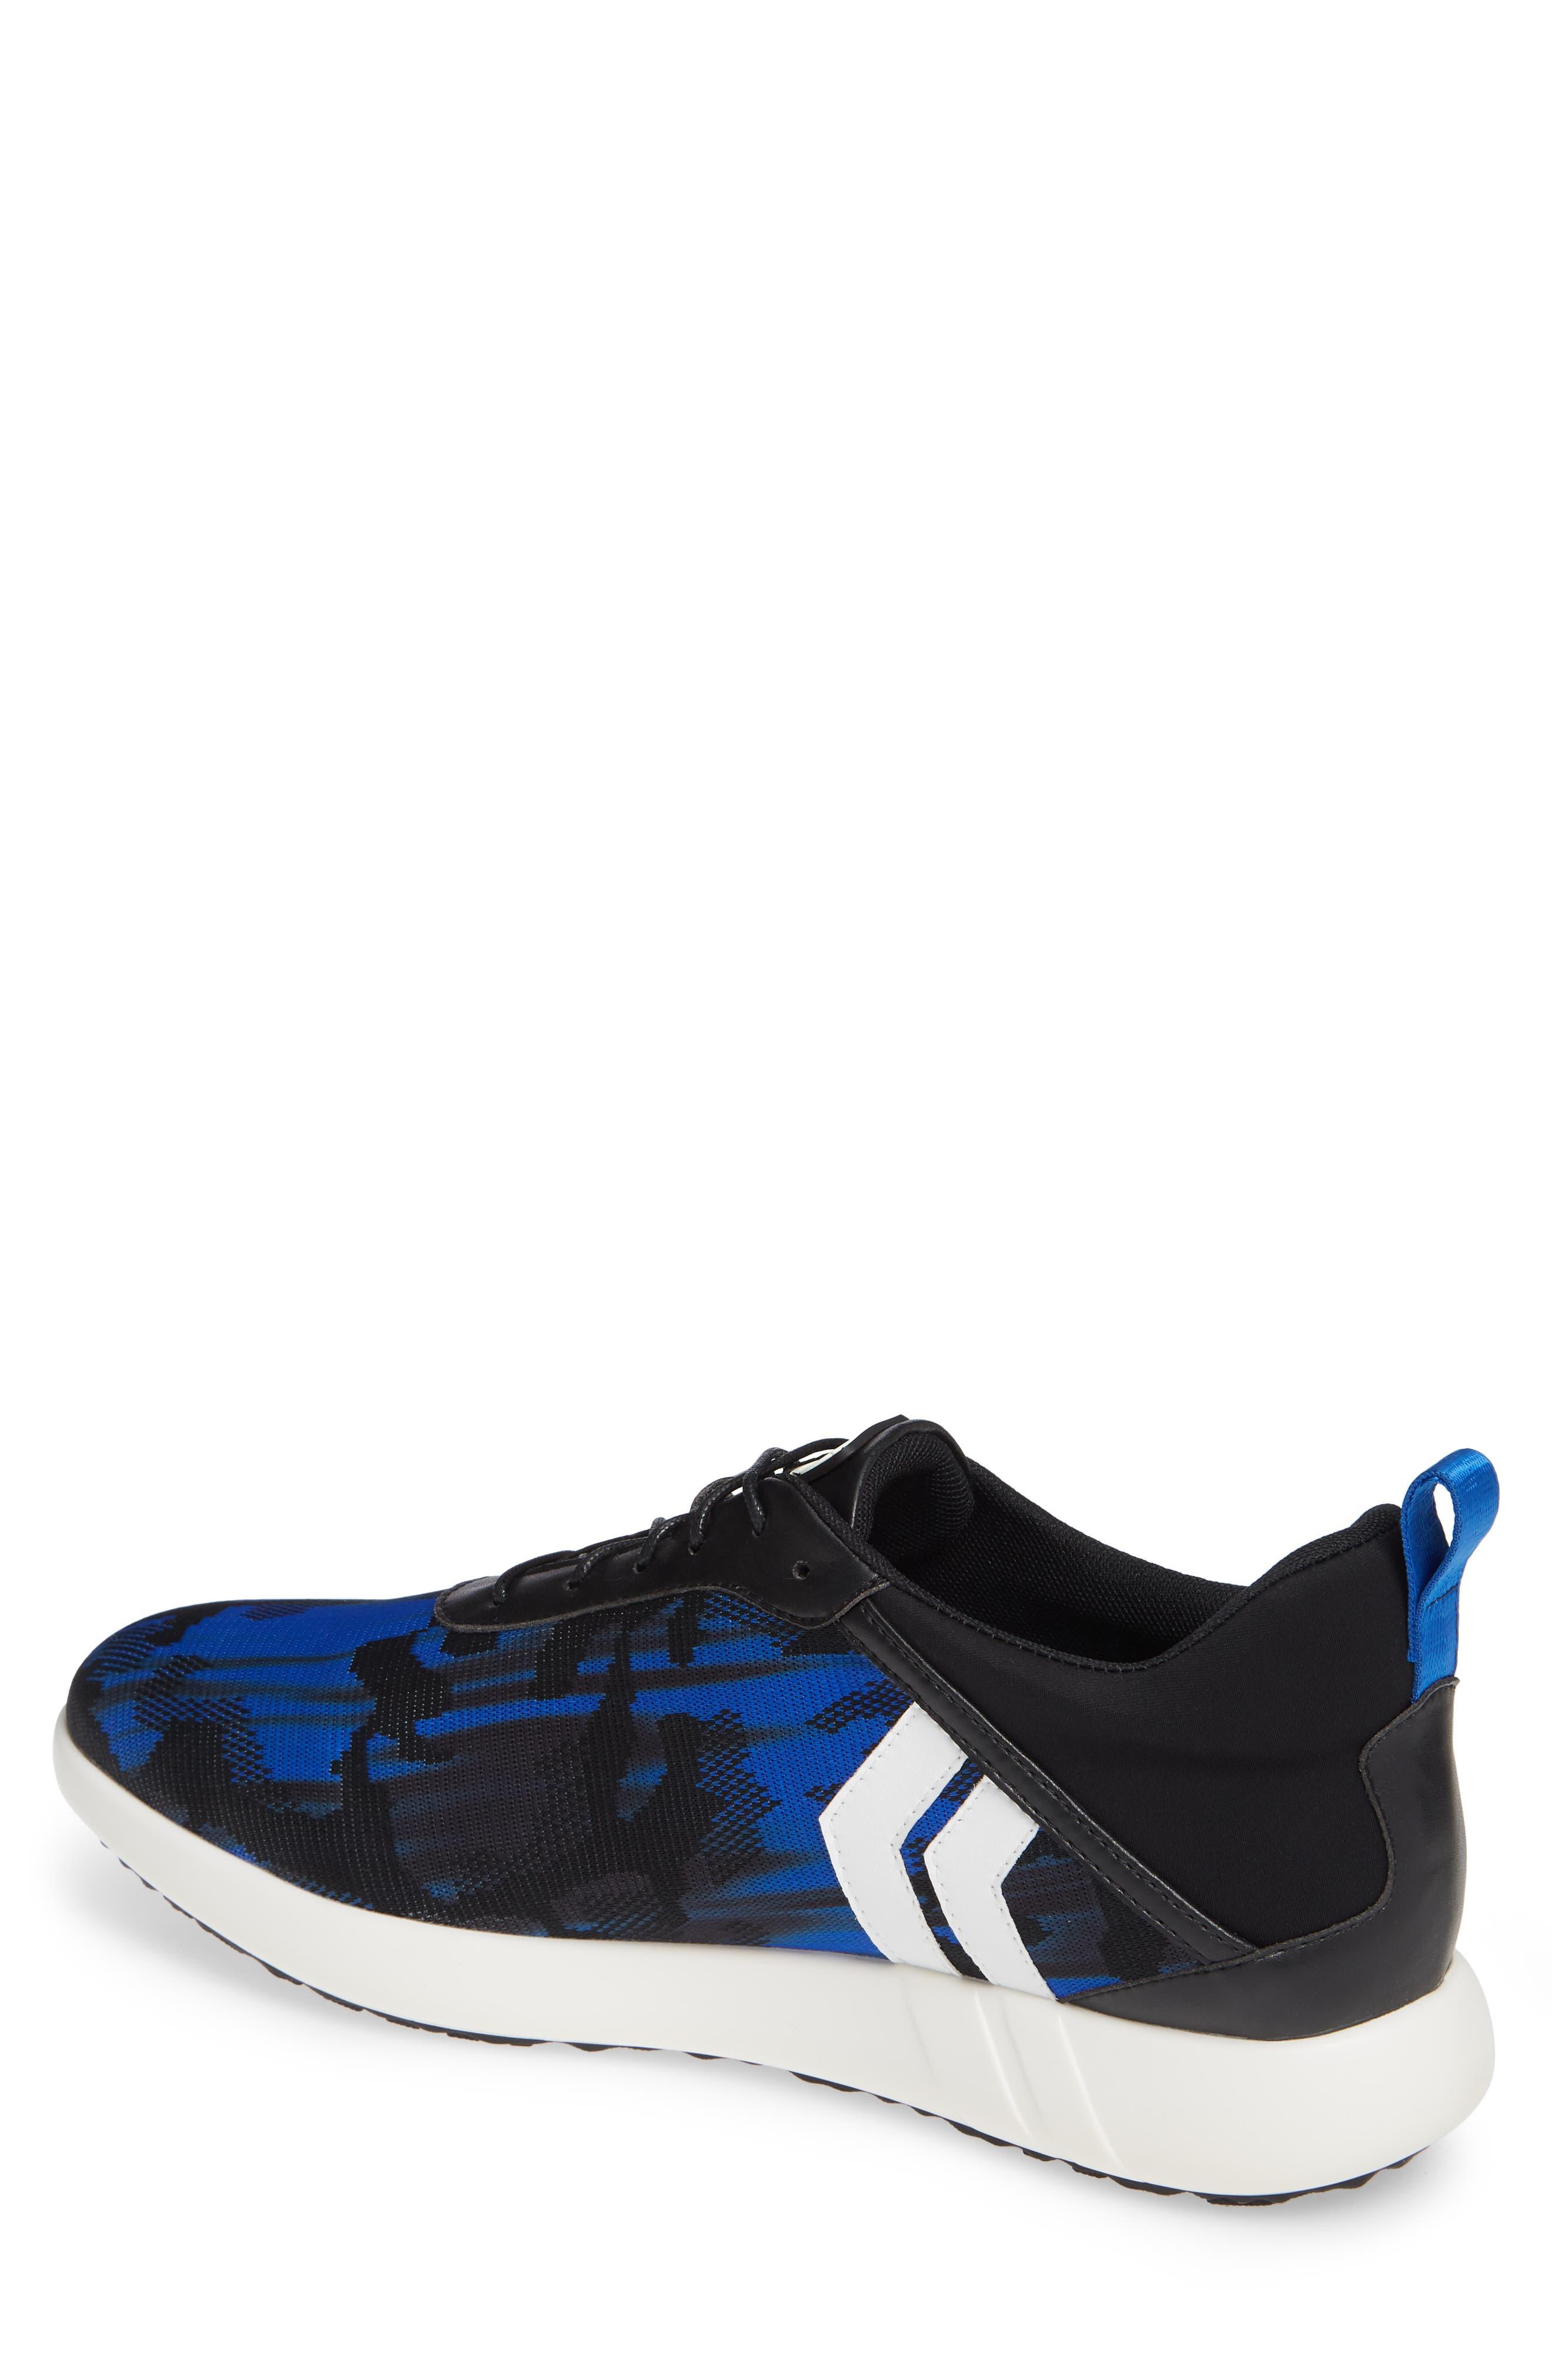 Ghost Sneaker,                             Alternate thumbnail 2, color,                             430